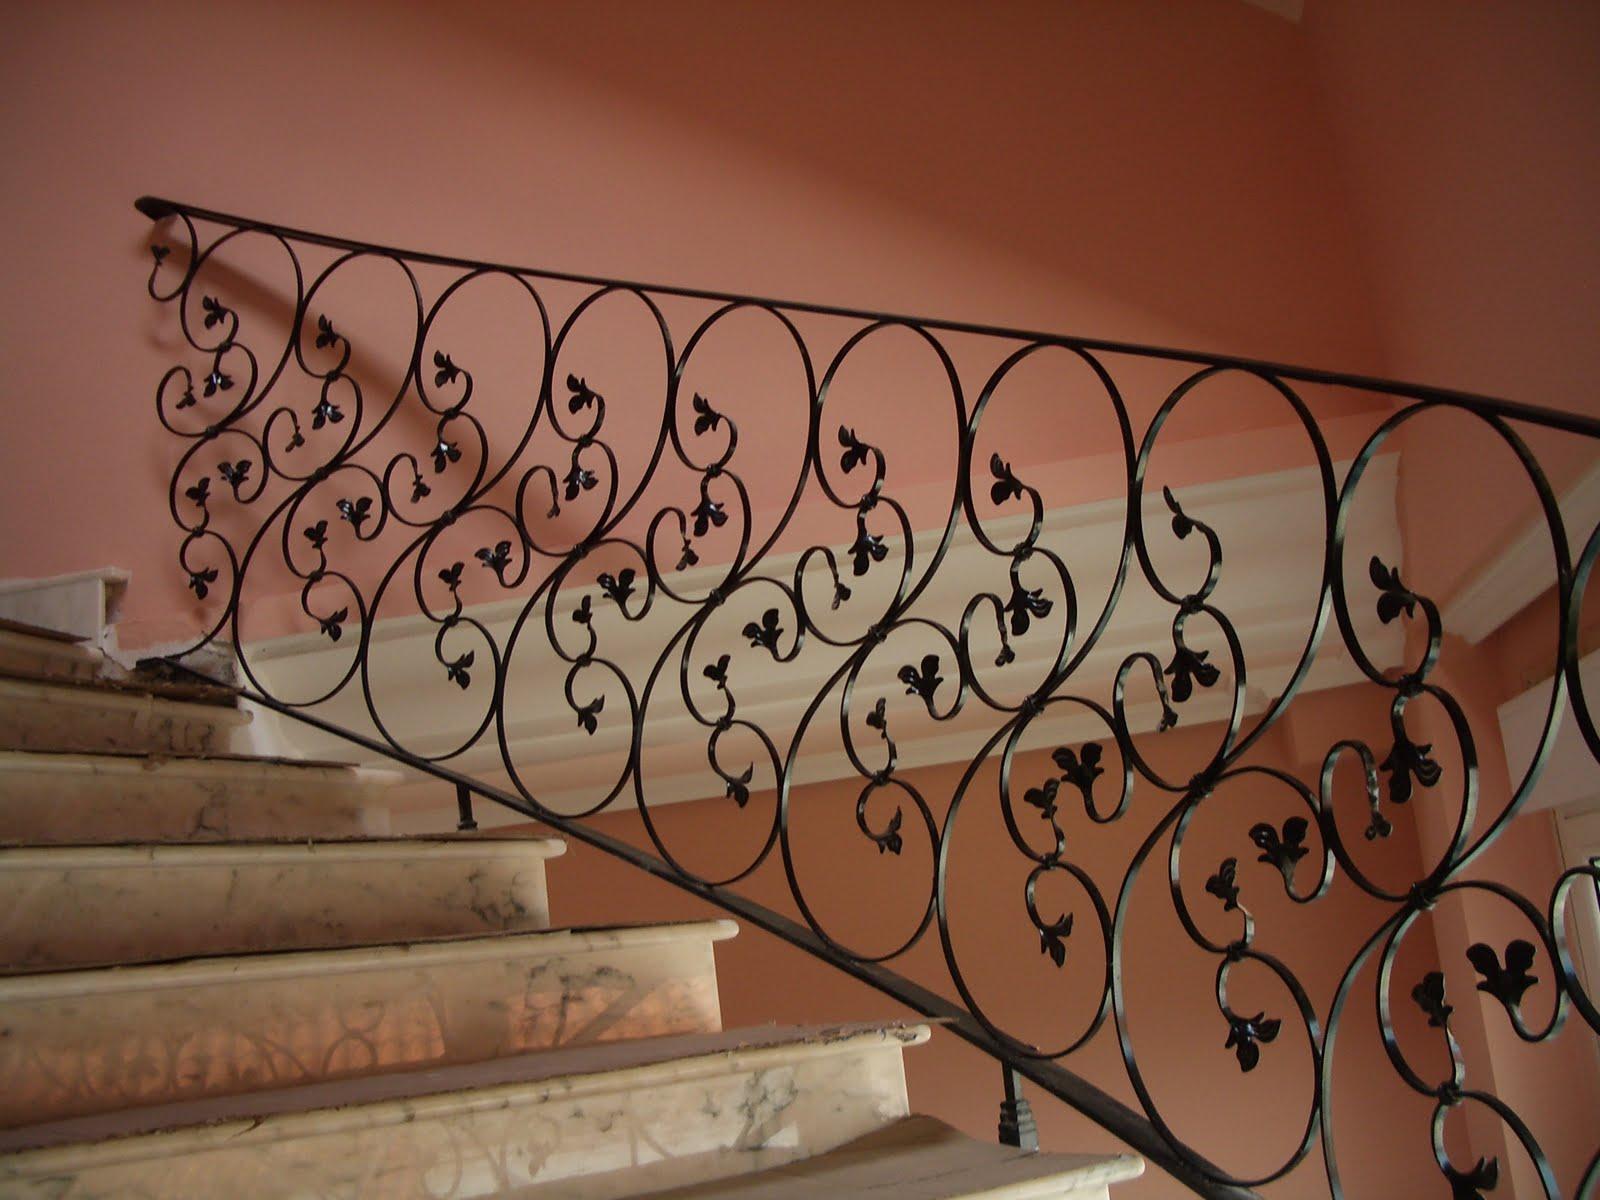 Talleres gra a s l pasamanos de hierro a coru a - Barandillas de forja para escaleras de interior ...